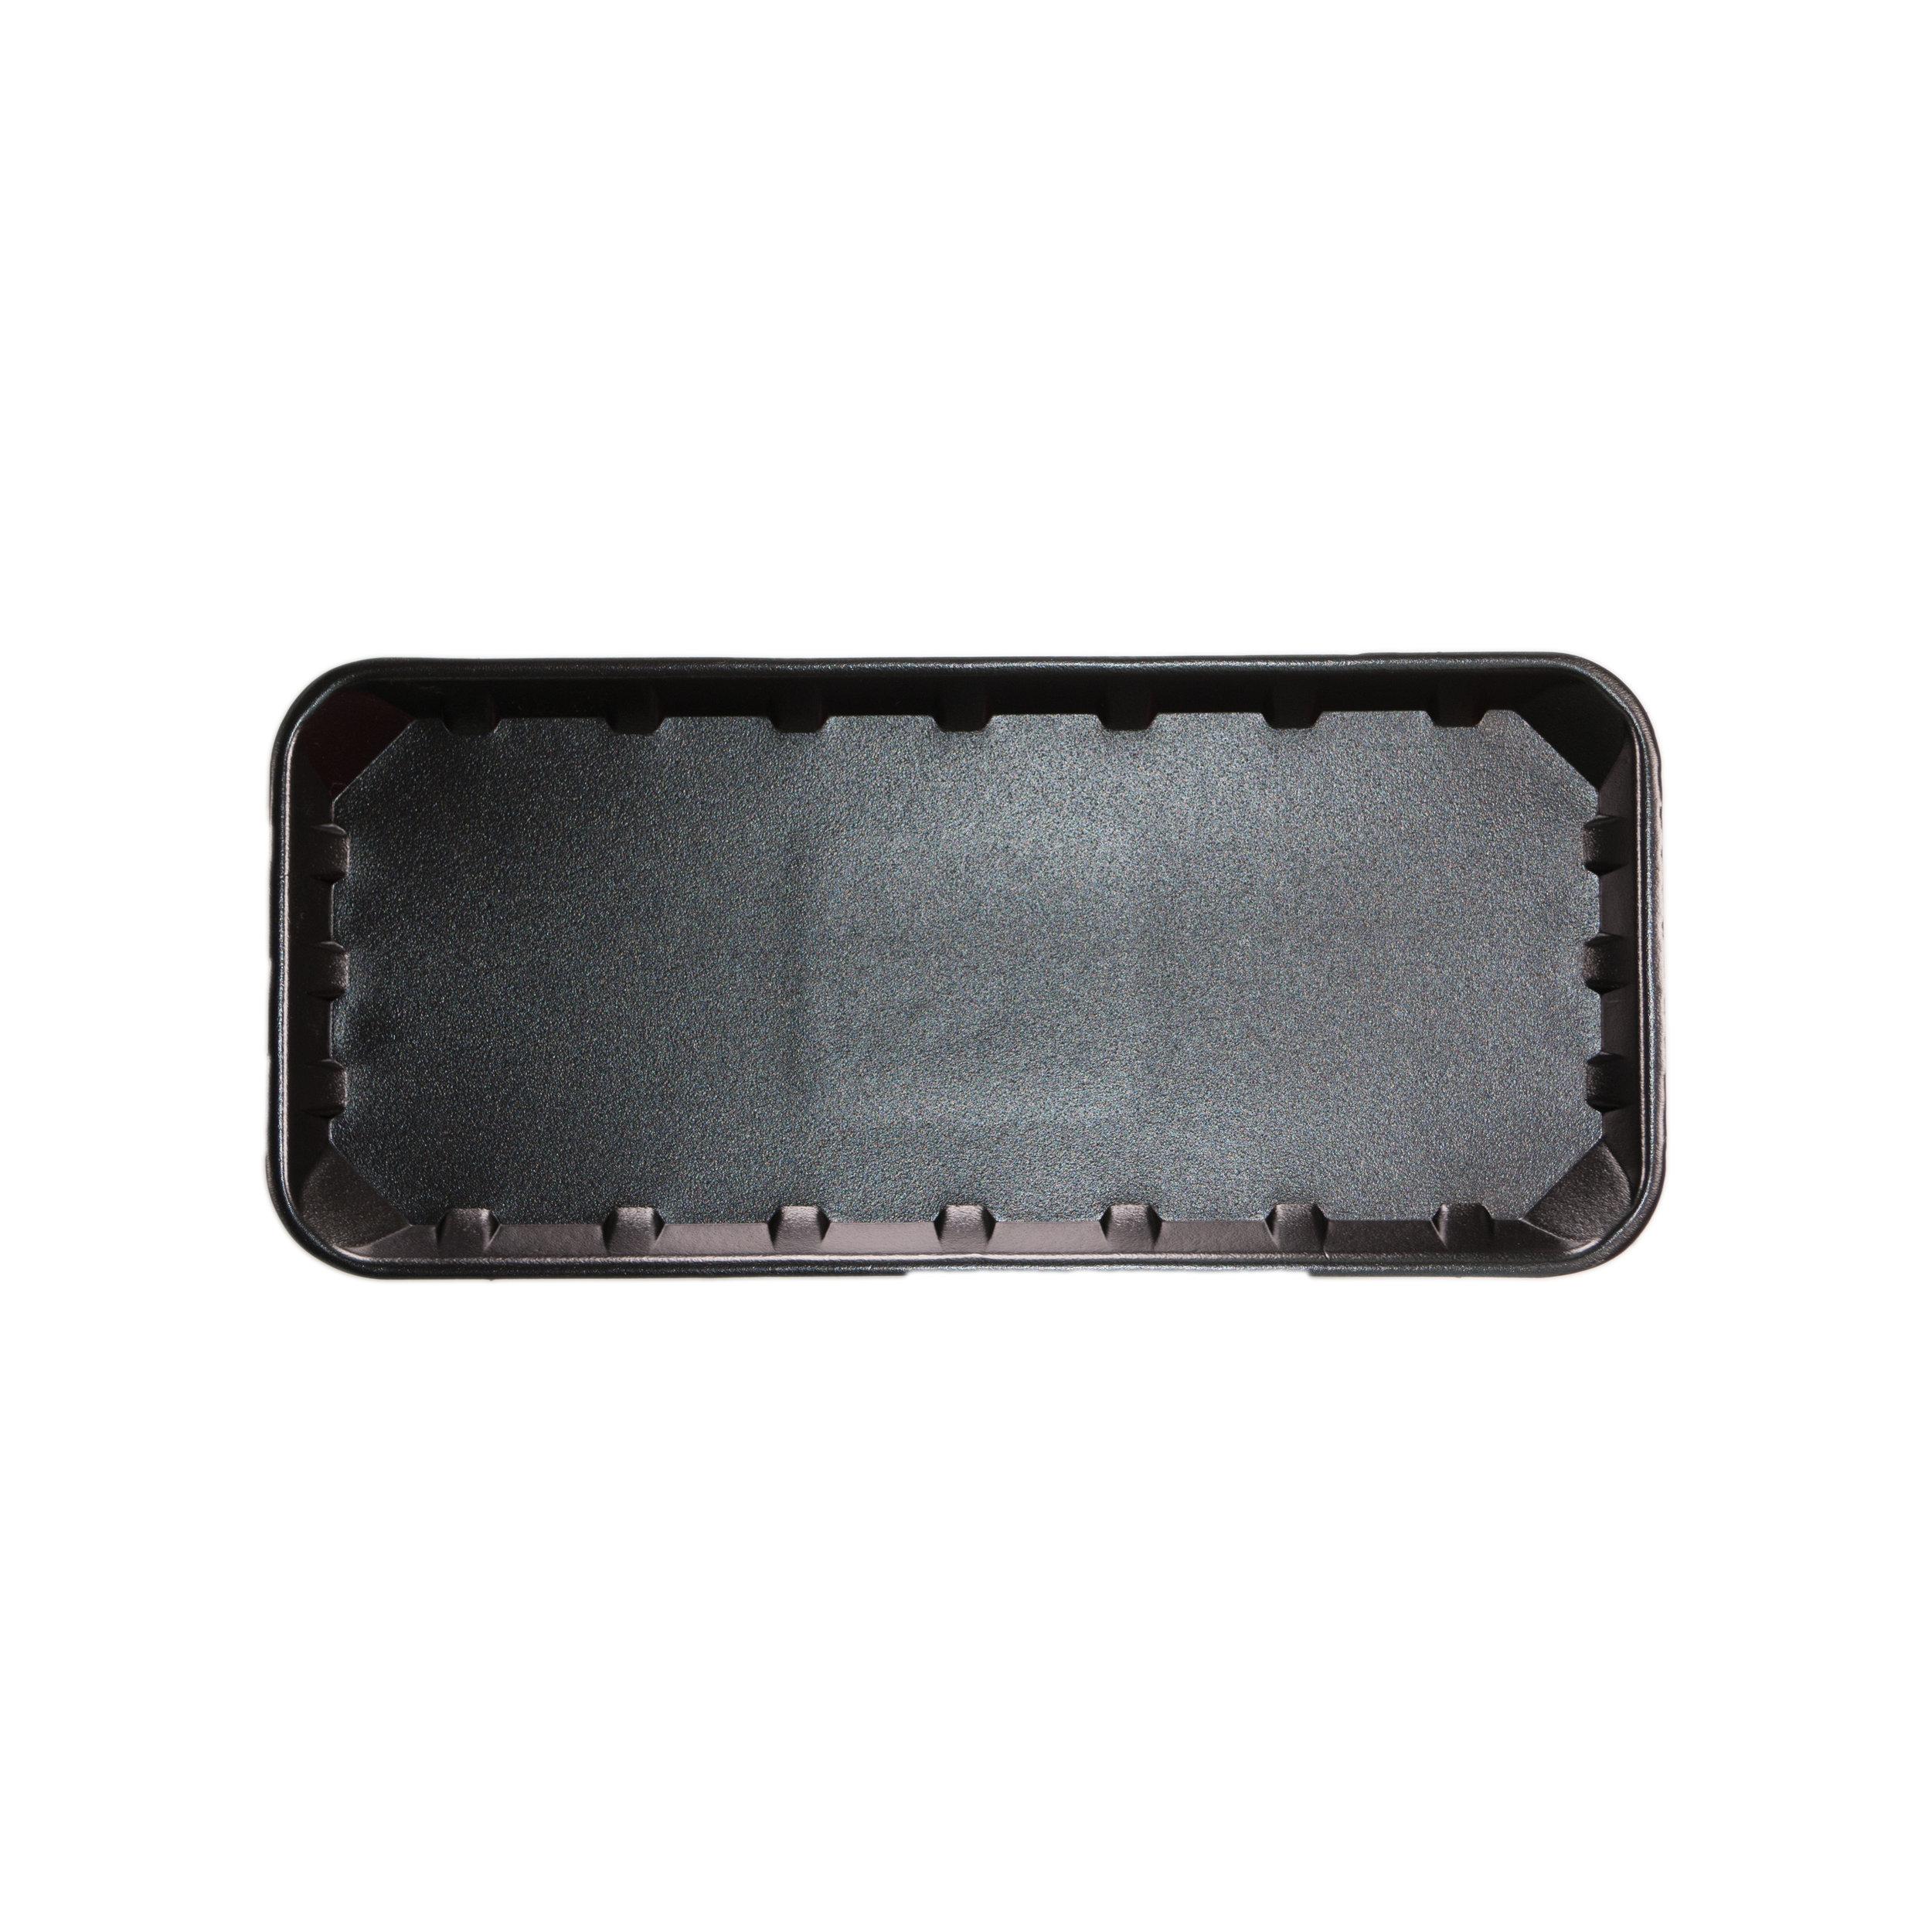 iK0306      CLOSED CELL SHALLOW 11x5    125 per sleeve 1000 per carton